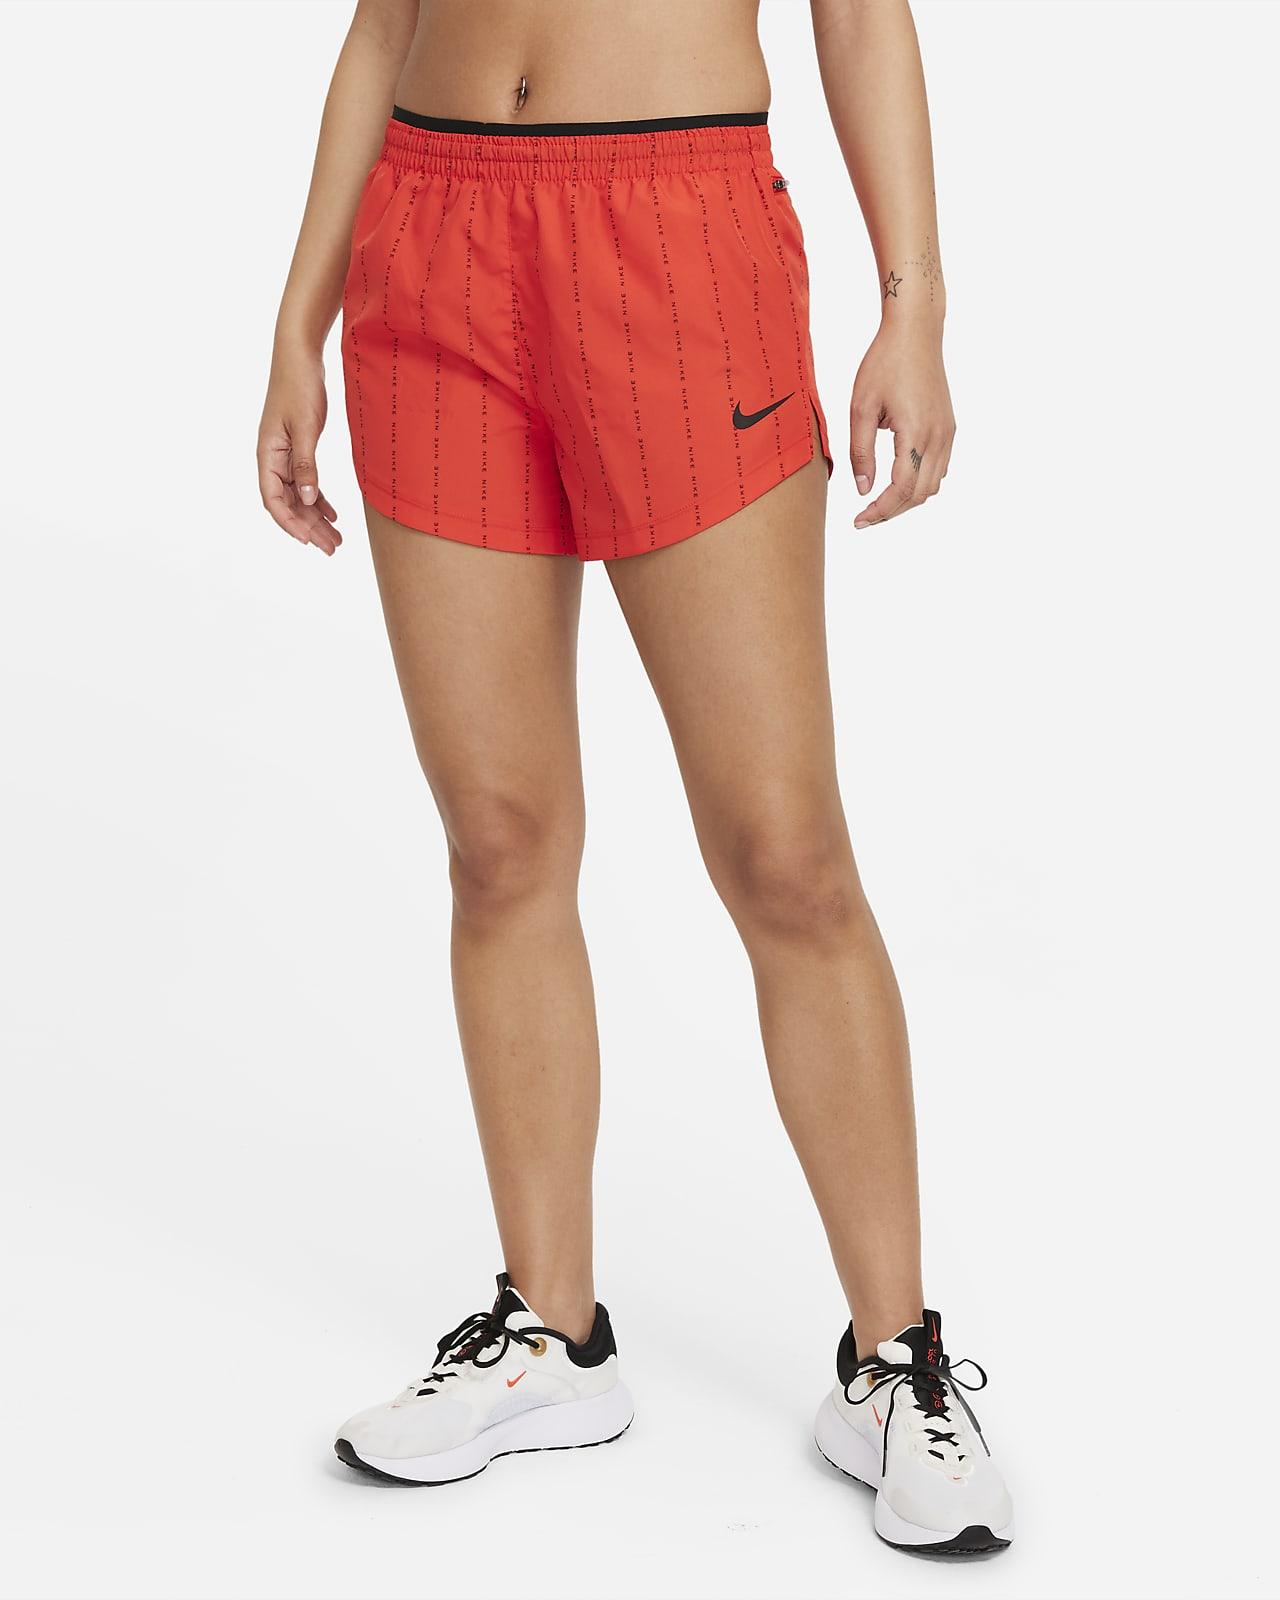 Nike Dri-FIT Tempo Luxe Icon Clash Women's Running Shorts